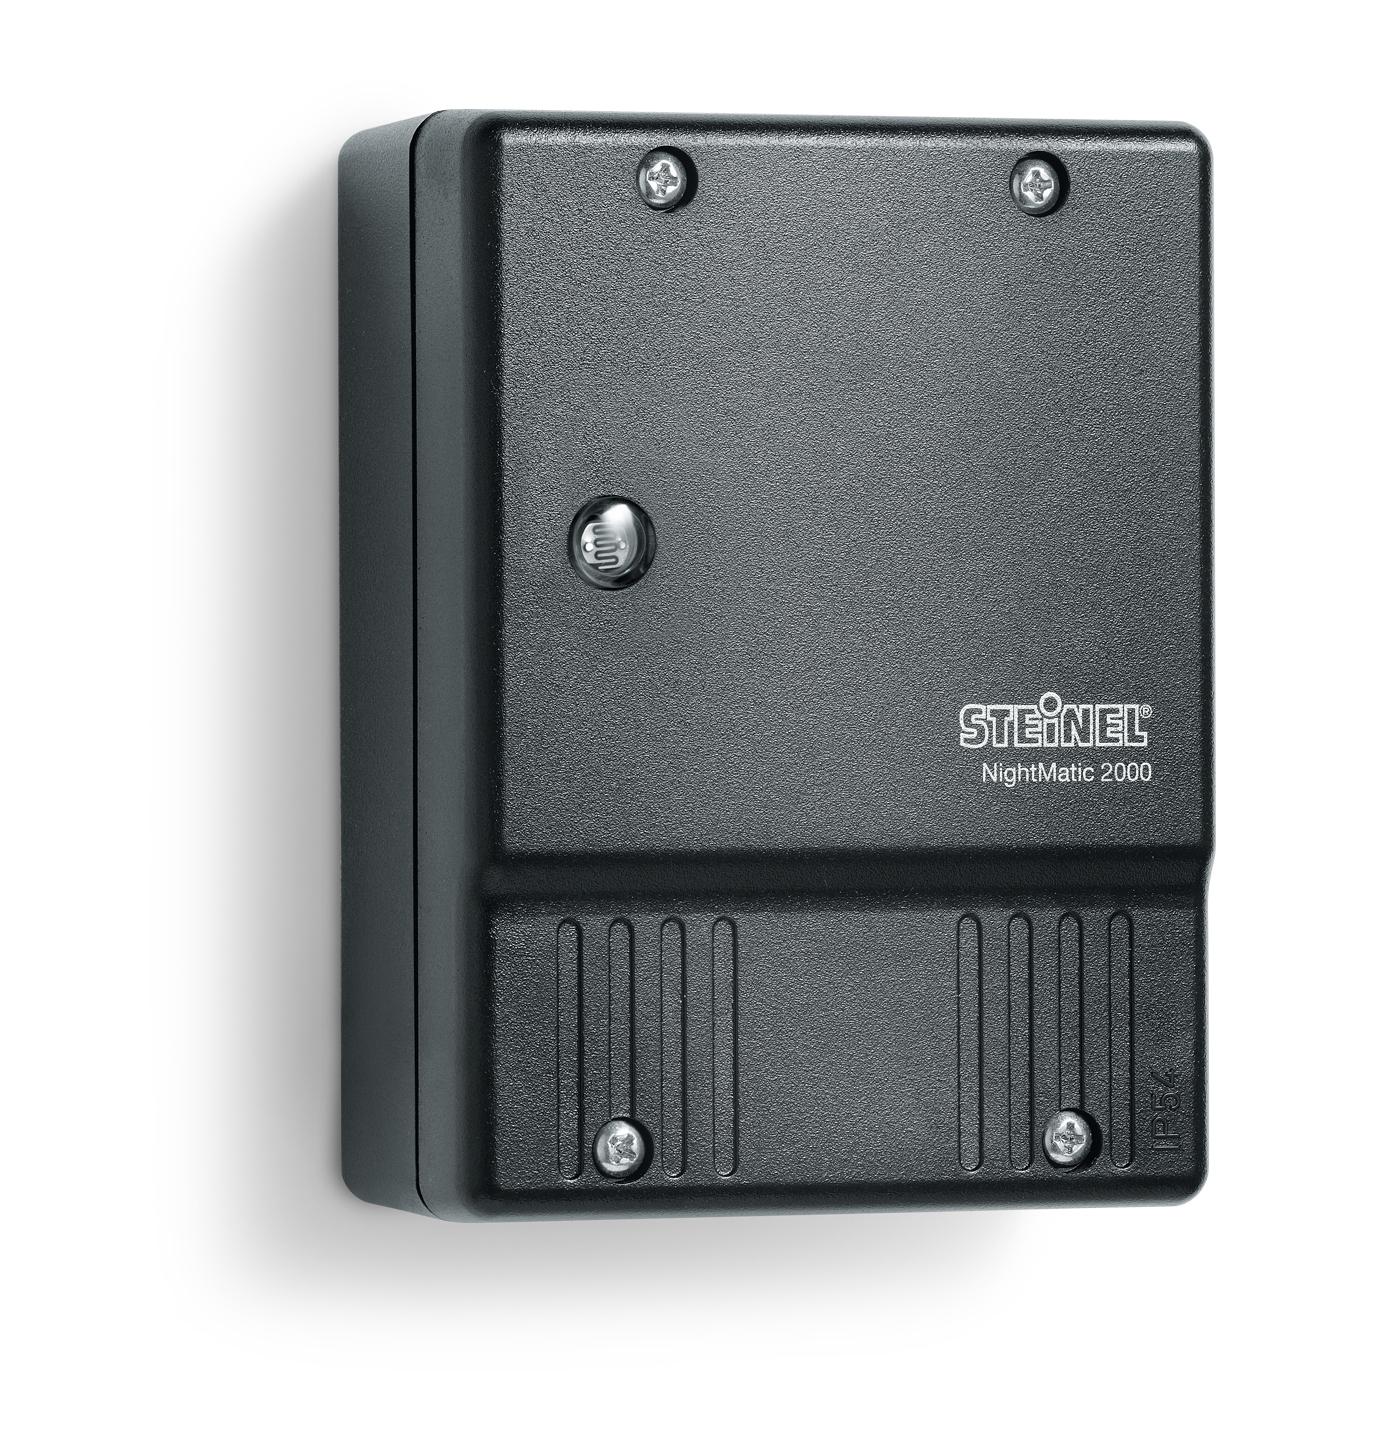 steinel nightmatic 2000 d mmerungsschalter lichtsensor sensor schwarz wei neu markenbaumarkt24. Black Bedroom Furniture Sets. Home Design Ideas